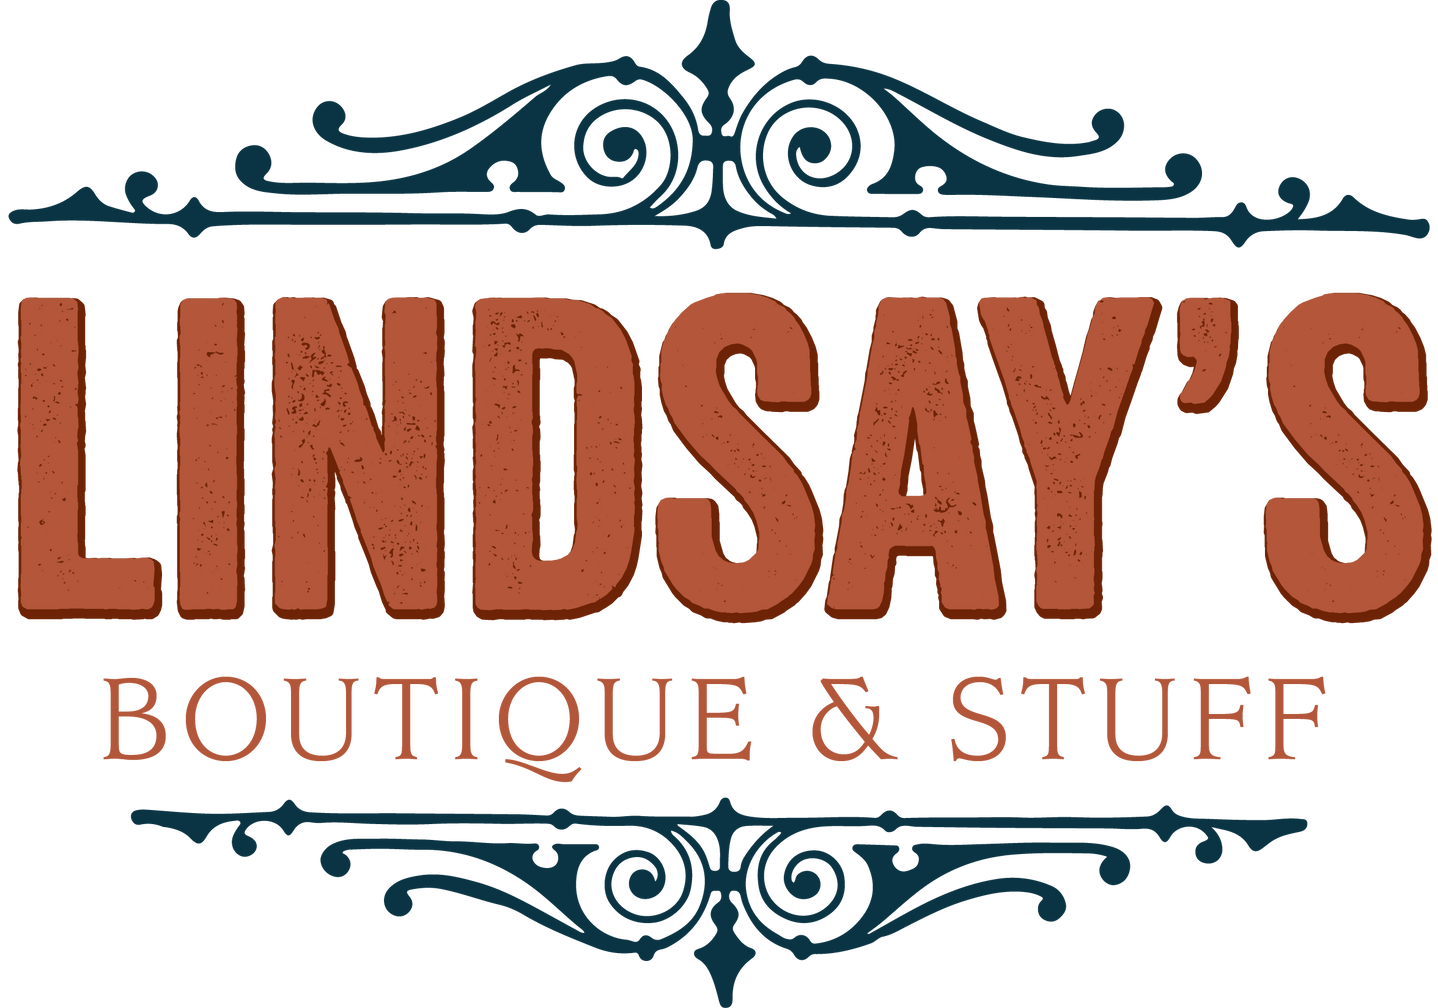 Lindsay's Boutique & Stuff